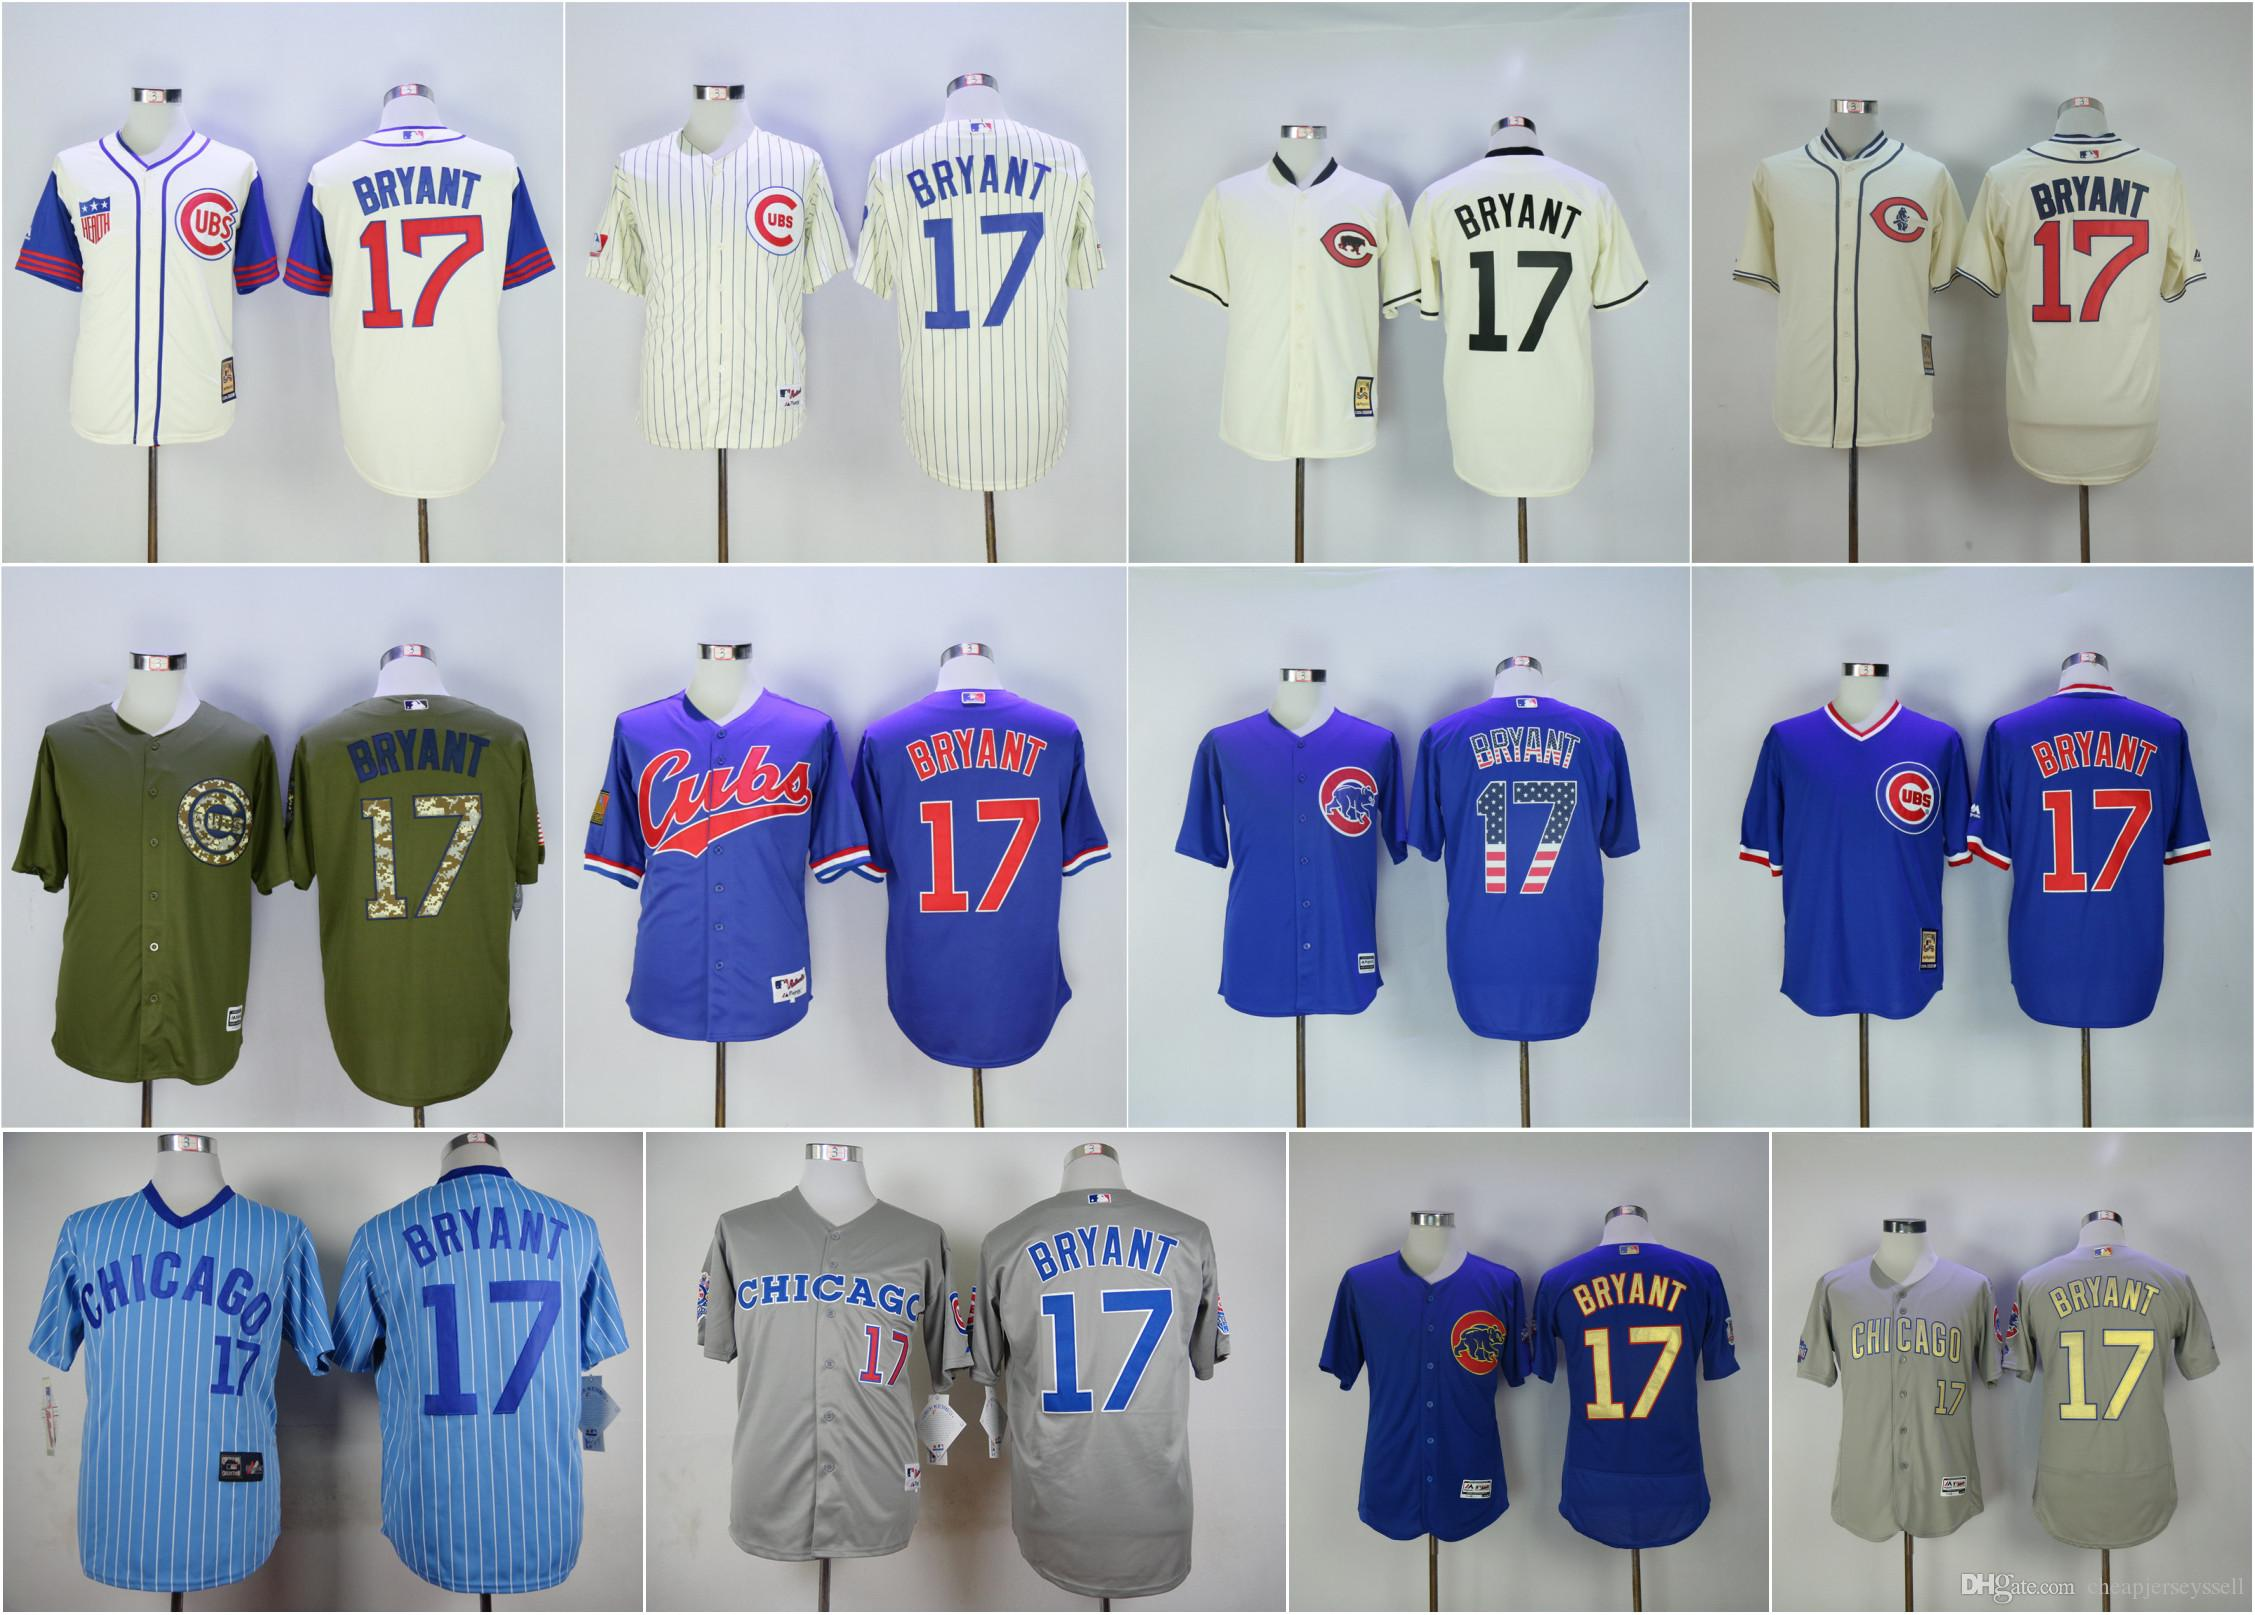 c3ea64d00e7 ... Authentic Collection MLB Jersey Mens 2017 17 Kris Bryant Jerseys MenS  Chicago Cubs Blue Usa Flag Cream 1942 1969 Blue 1994 ...